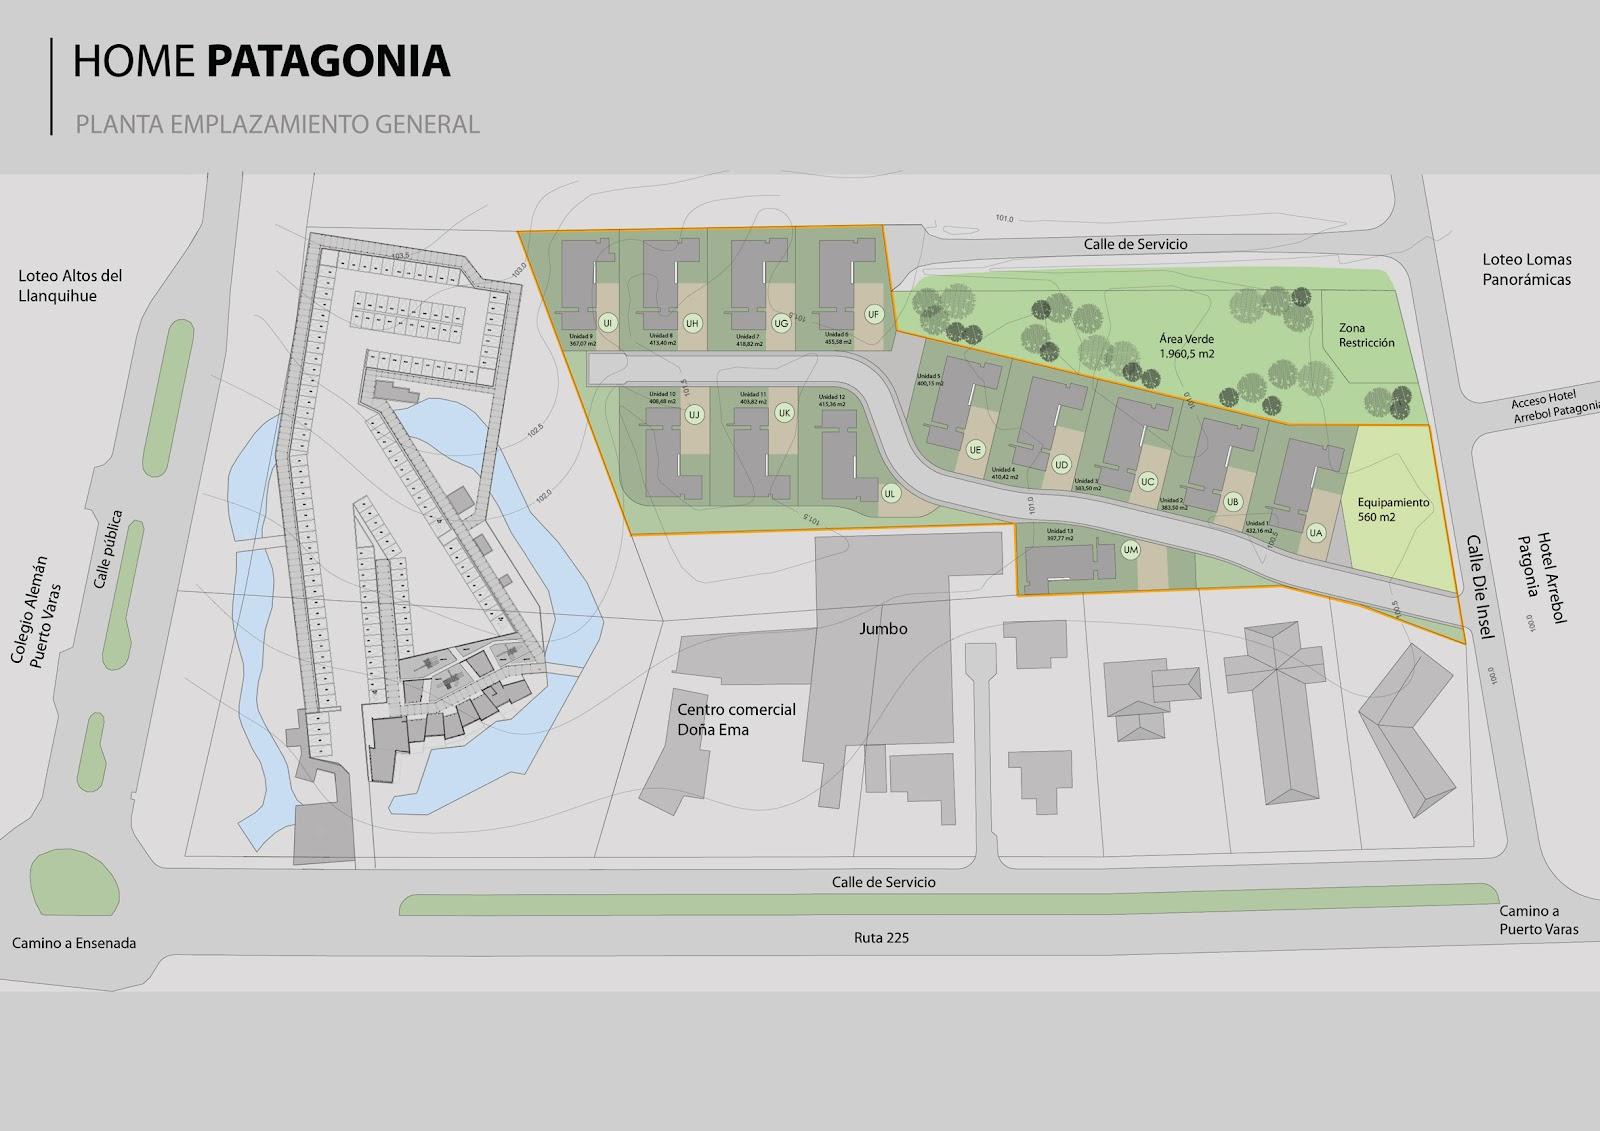 Desarrollo de master plan para urbanizaci n home patagonia for Plan de arquitectura